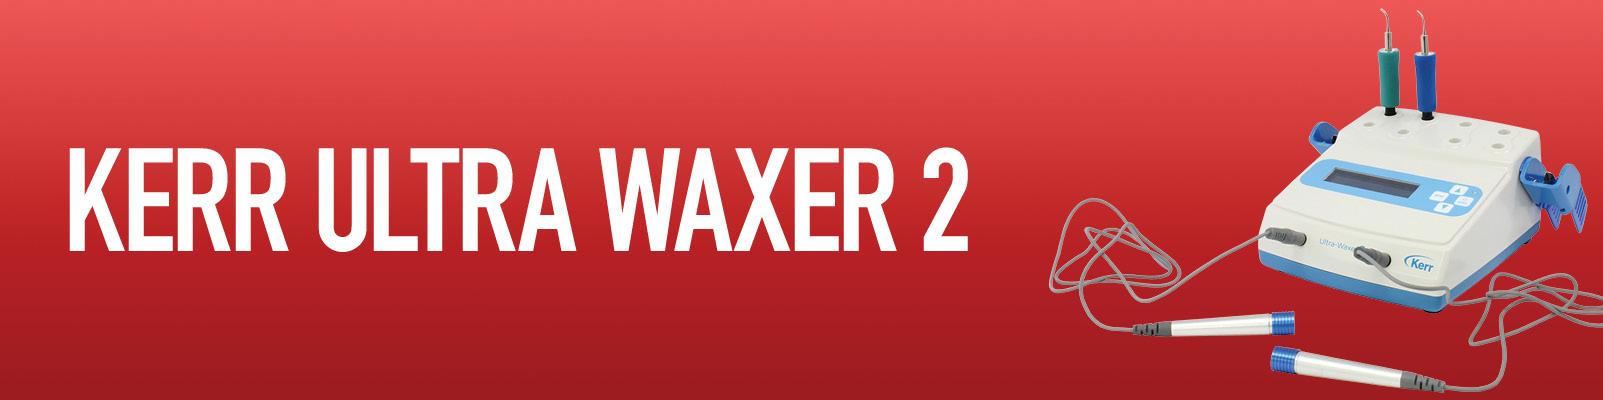 Kerr Ultra-Waxer 2